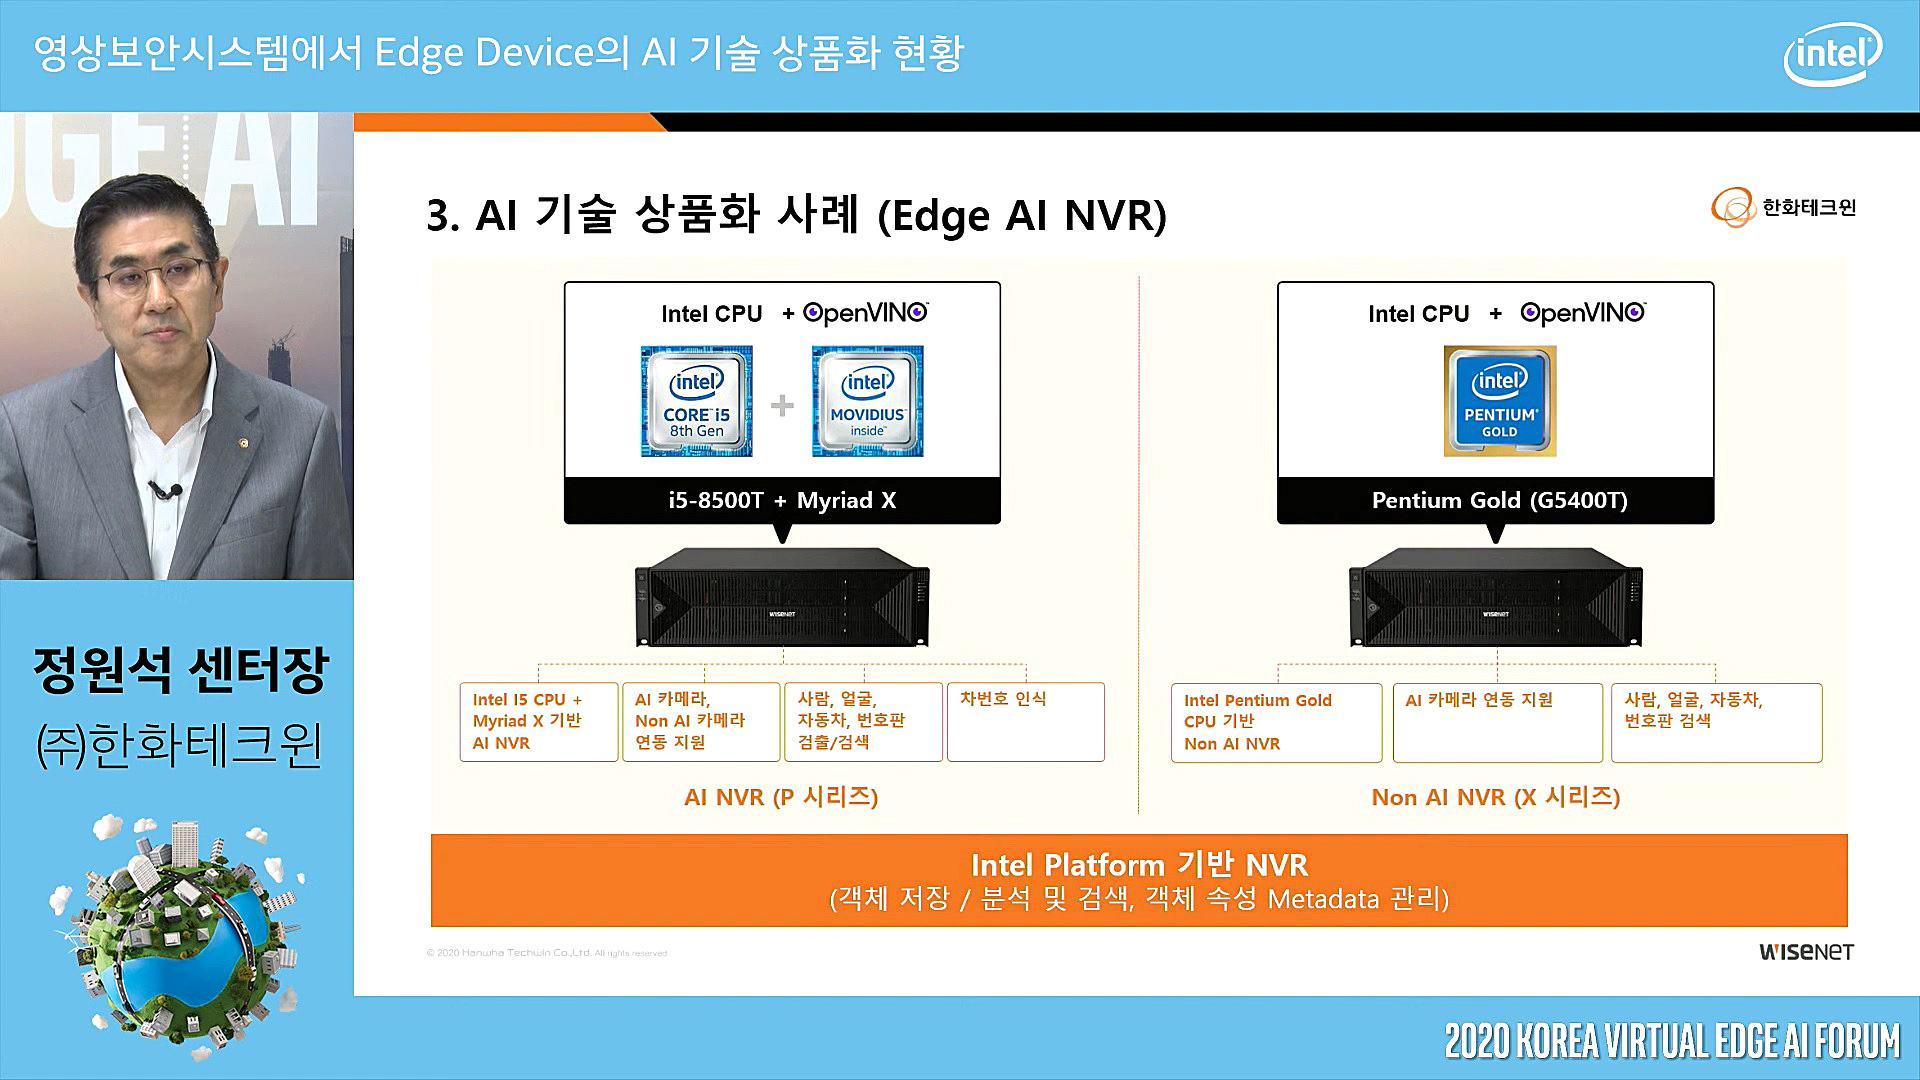 200729_Korea Edge AI Forum_Contents_2